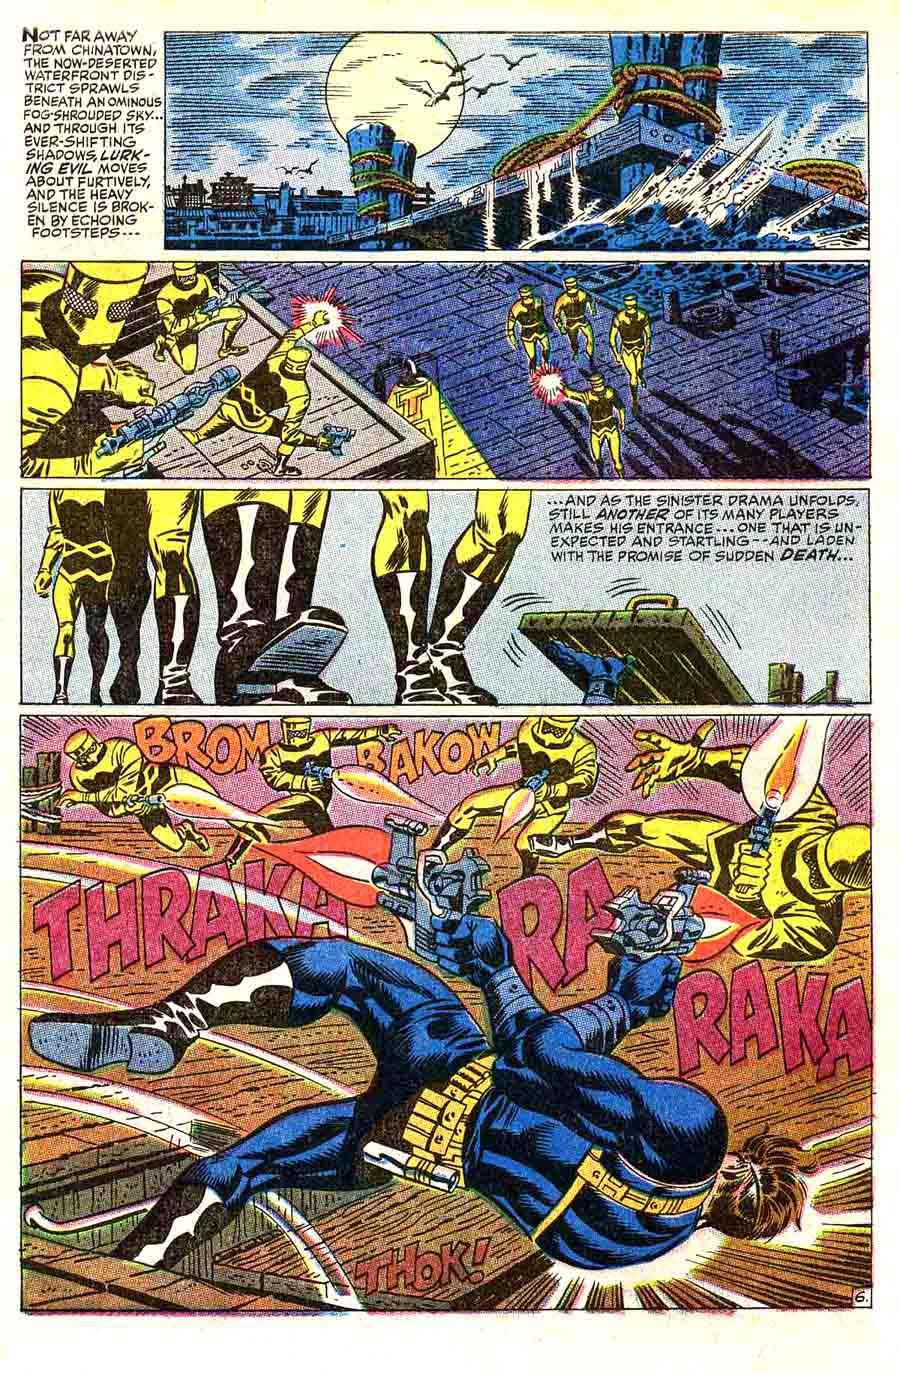 Strange Tales v1 #163 nick fury shield comic book page art by Jim Steranko